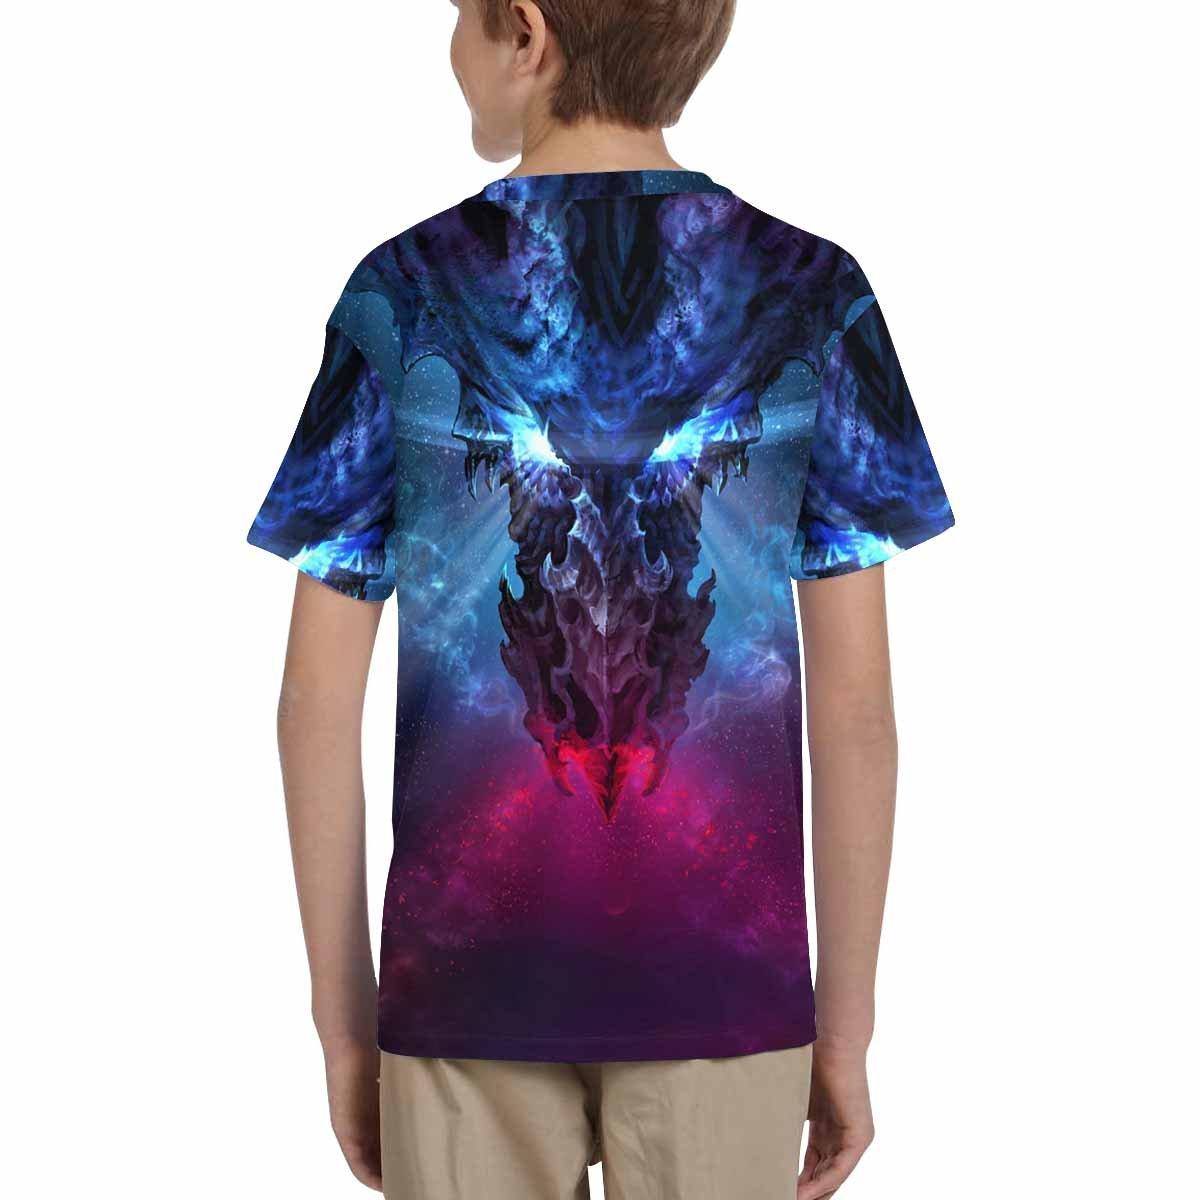 XS-XL INTERESTPRINT Kids T-Shirt A Huge Black Dragon